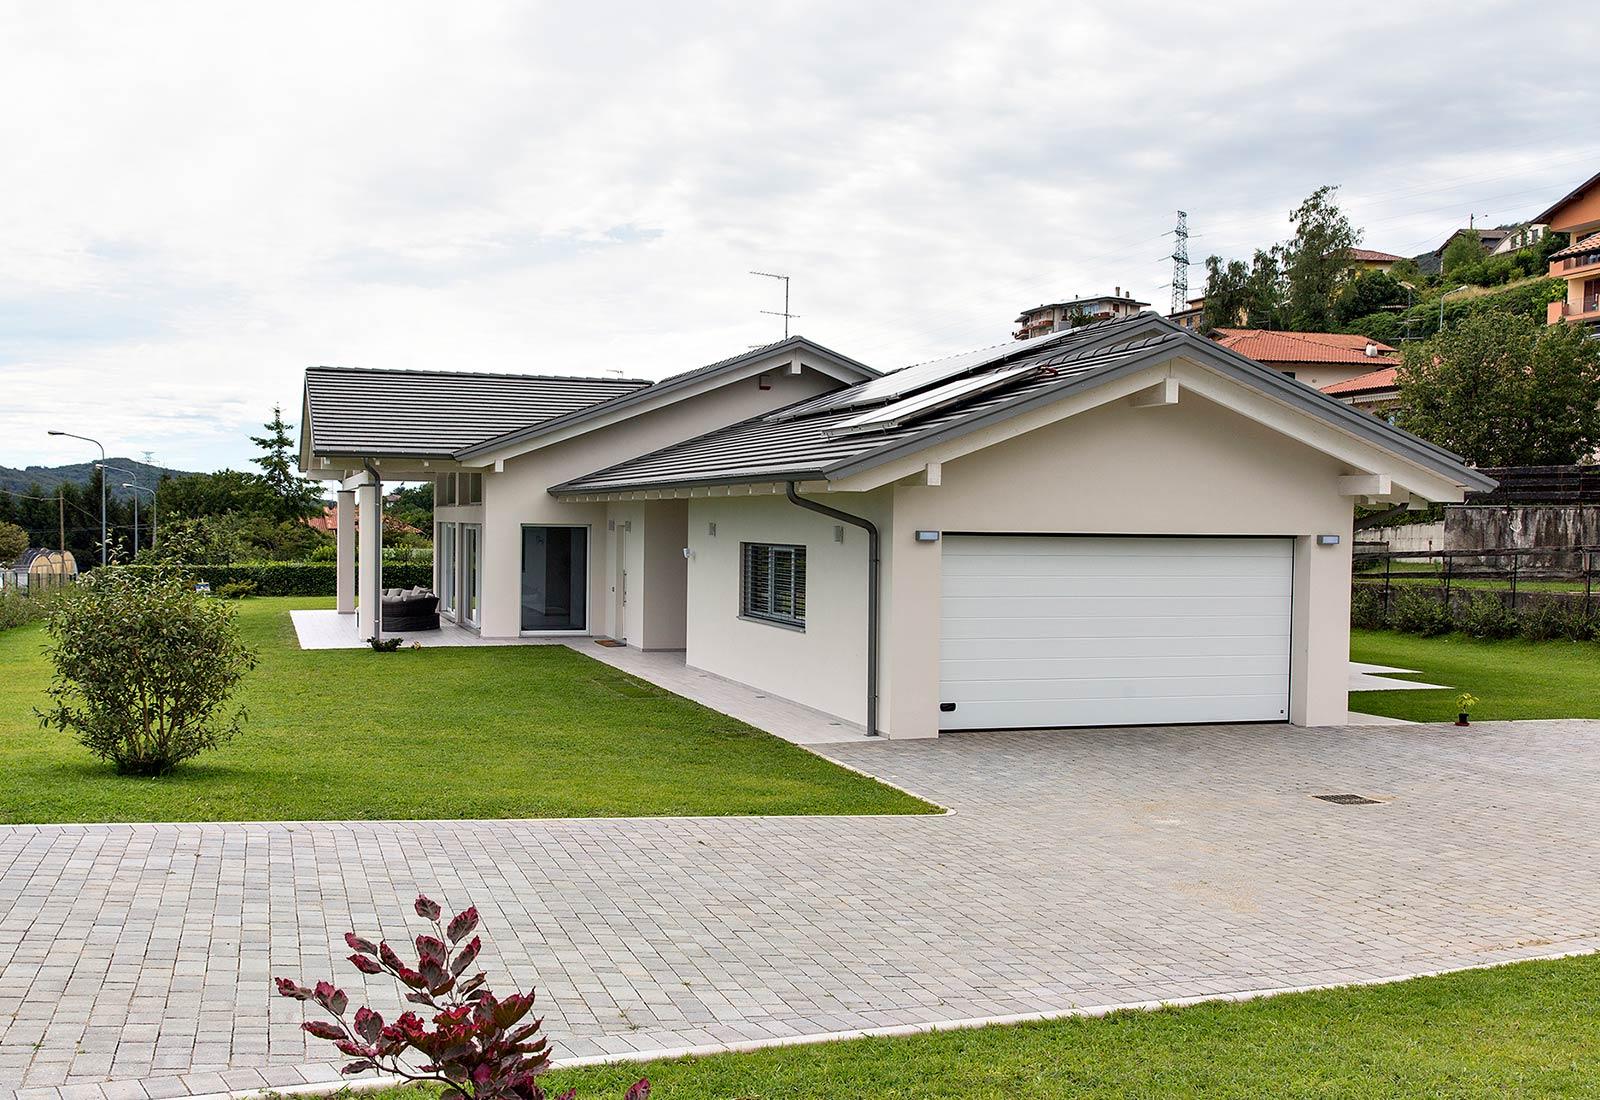 Casa-in-legno-Nebbiuno-Novara-Kager-Italia-02